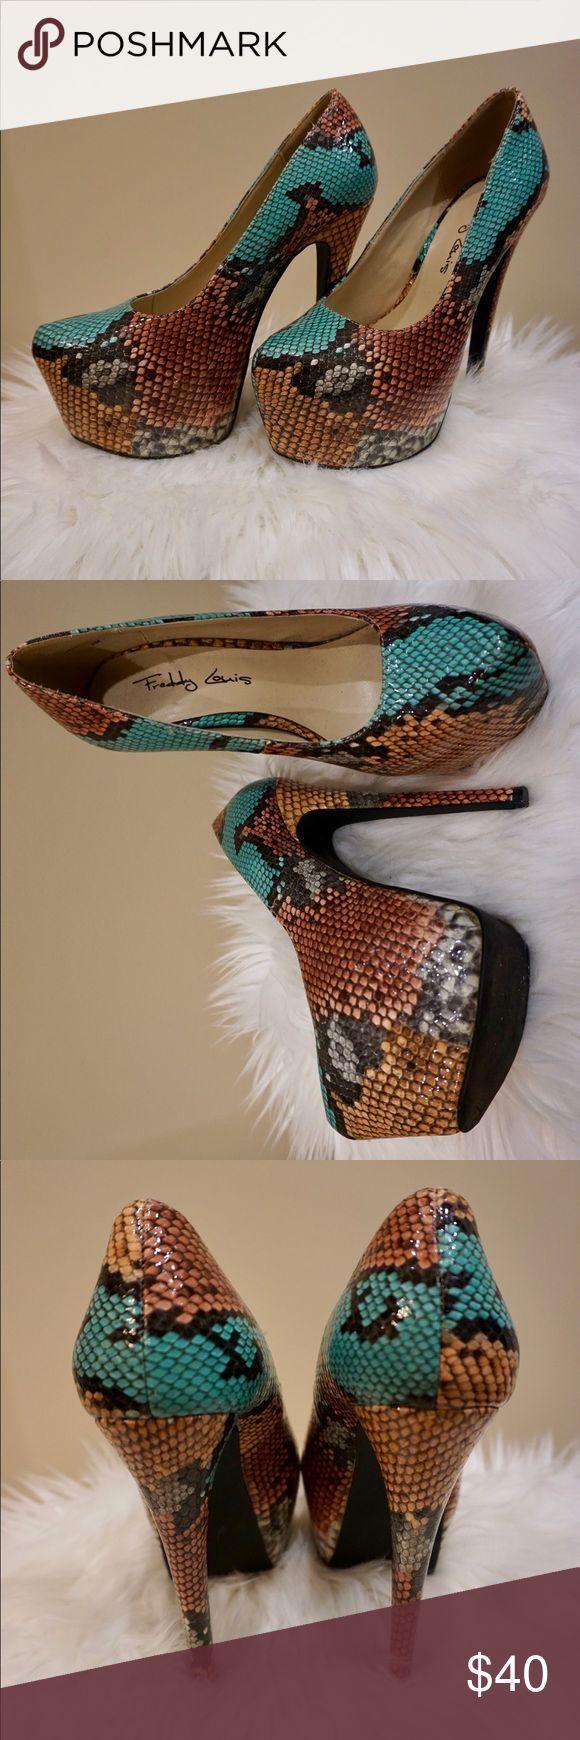 "Freddy Louis ""Chloe"" Faux Python Multi Color Pumps Color: Multi (Black, Teal, Sand, Rust, Off White) - Barely Worn Freddy Louis Shoes Platforms"